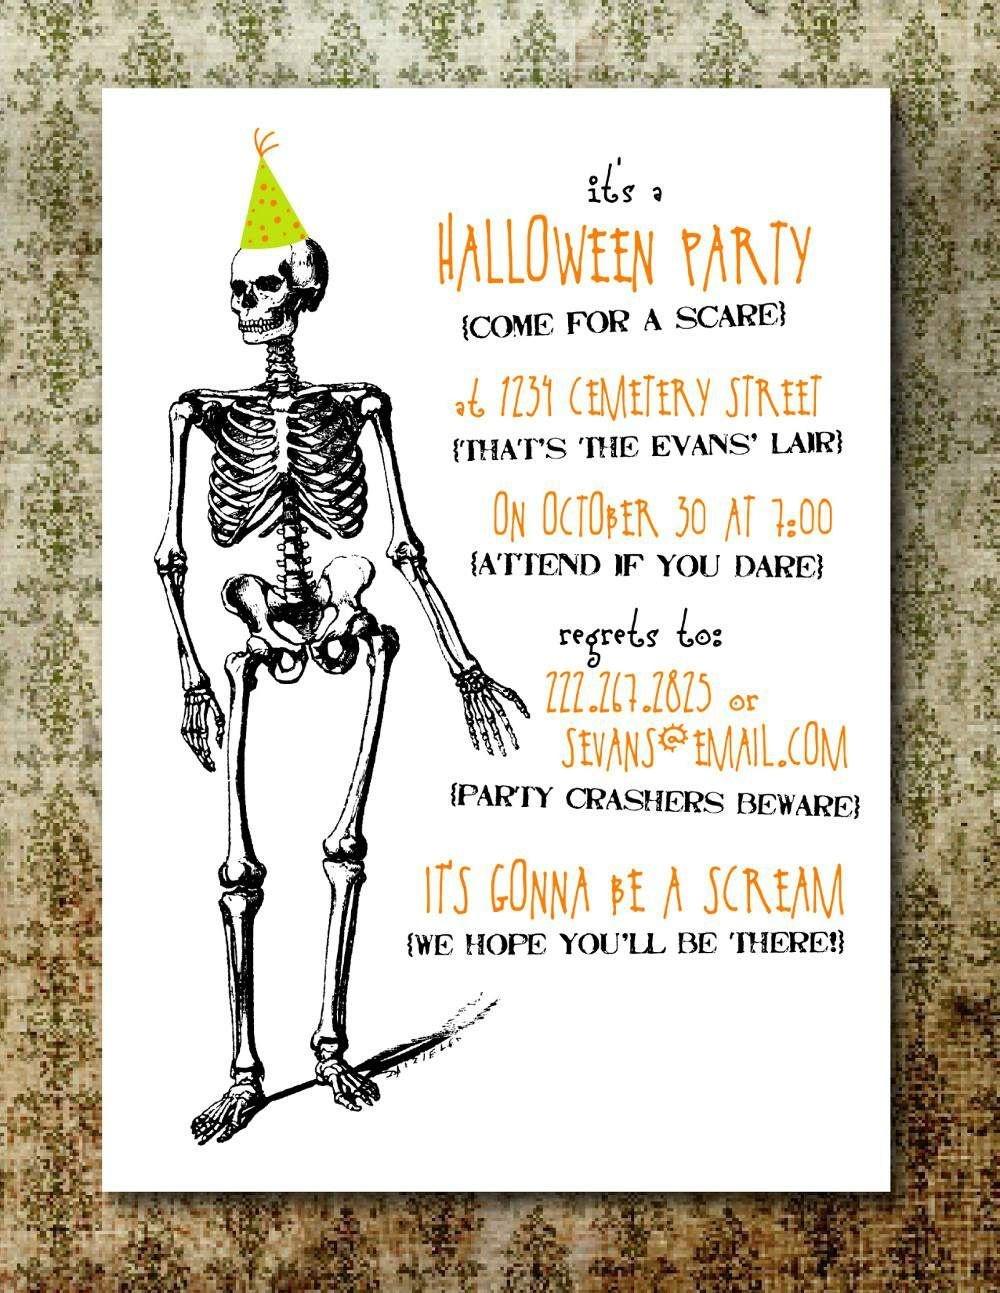 Free Printable Halloween Invitation Templates   Free Printable - Free Printable Halloween Party Invitations